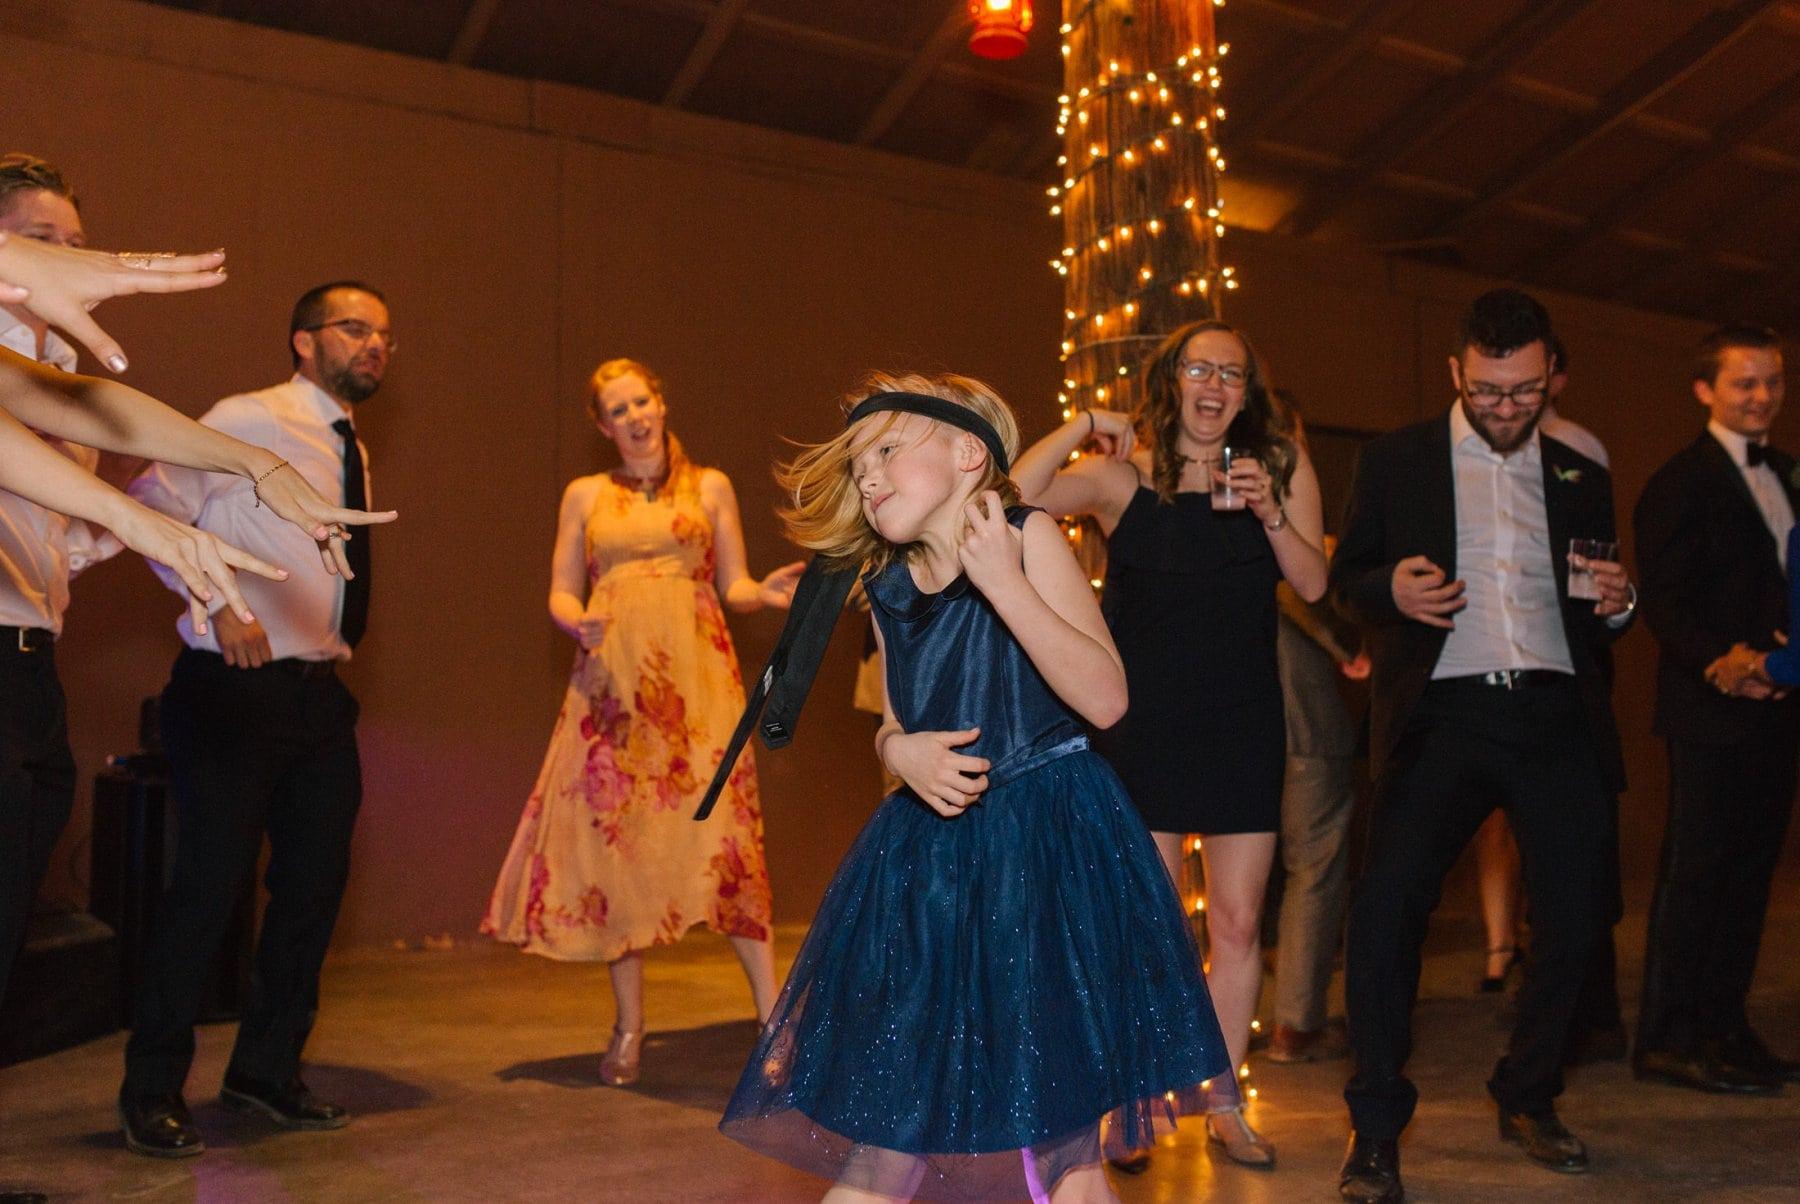 Arizona documentary wedding photographer Alyssa Campbell Desert Foothills wedding reception little girl rocking out